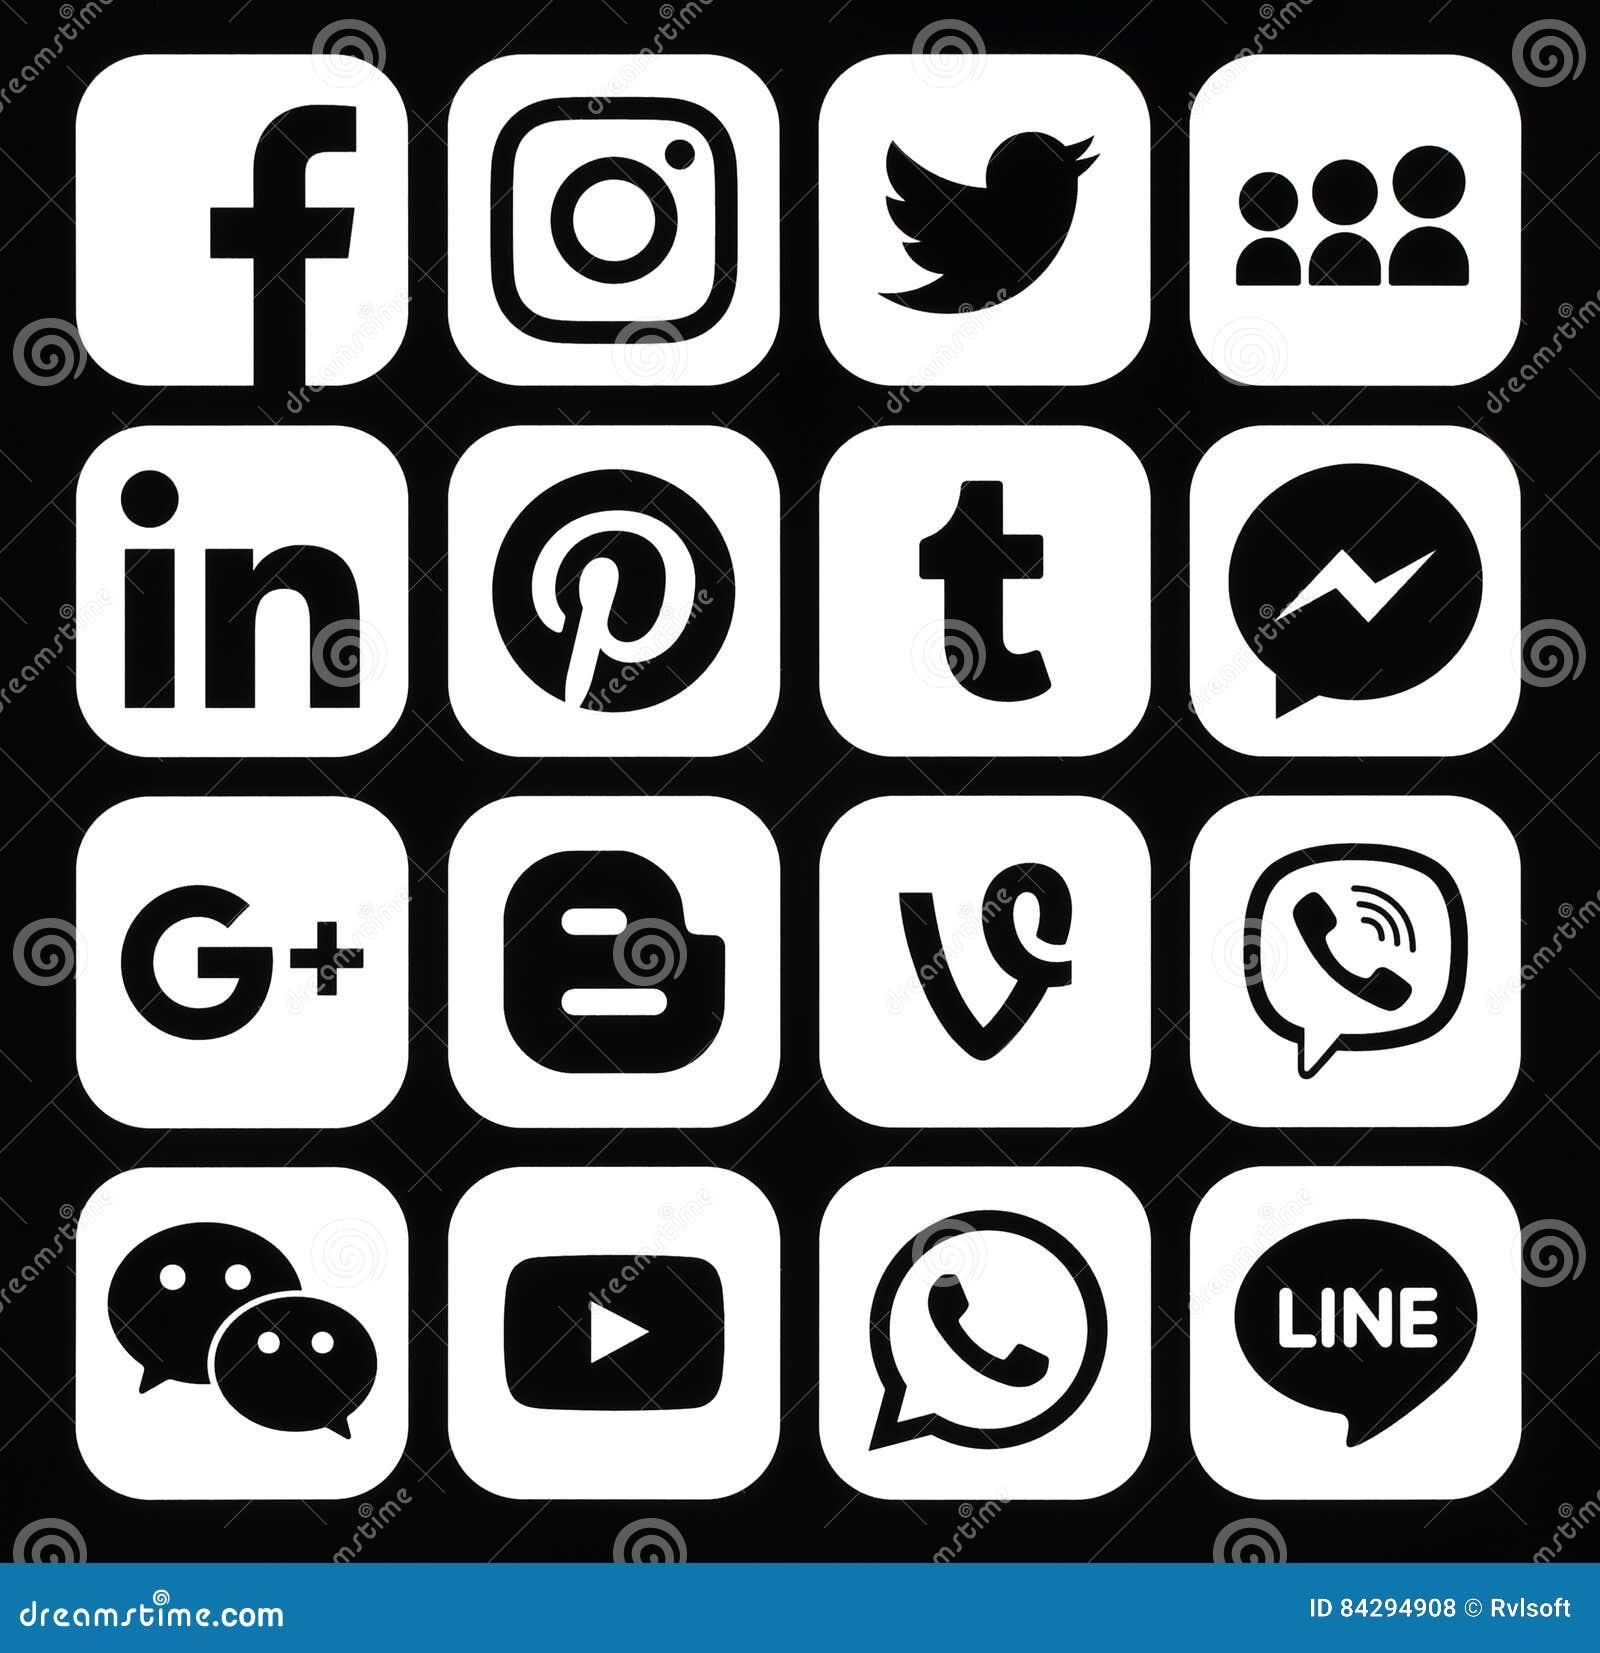 Kiev ukraine december 05 2016 collection of popular white social media icons printed on black paper facebook twitter google plus instagram